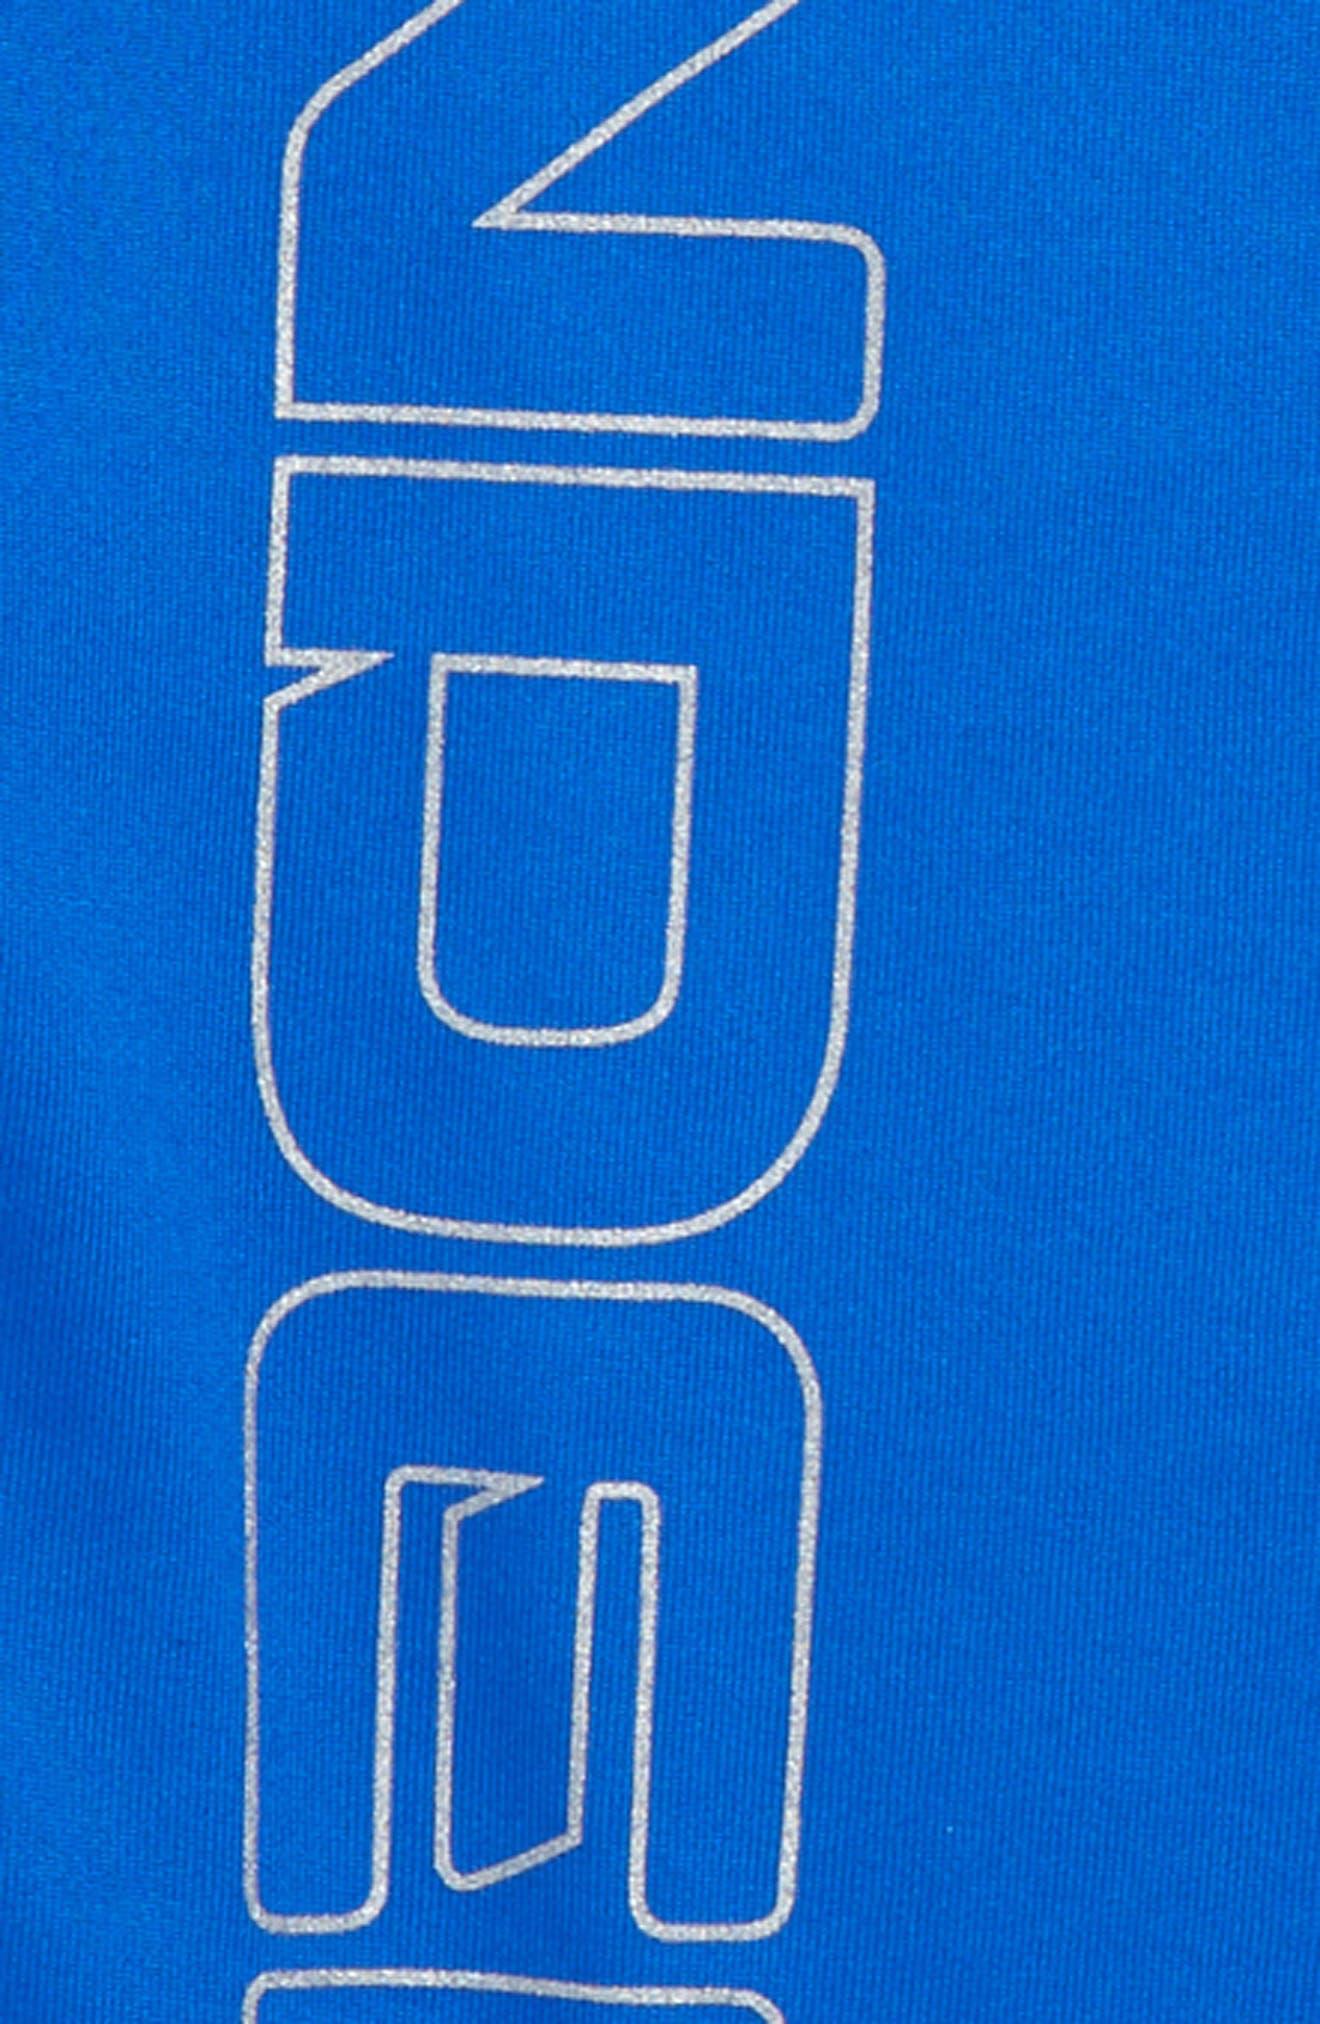 Mesh Tech HeatGear<sup>®</sup> T-Shirt,                             Alternate thumbnail 3, color,                             420